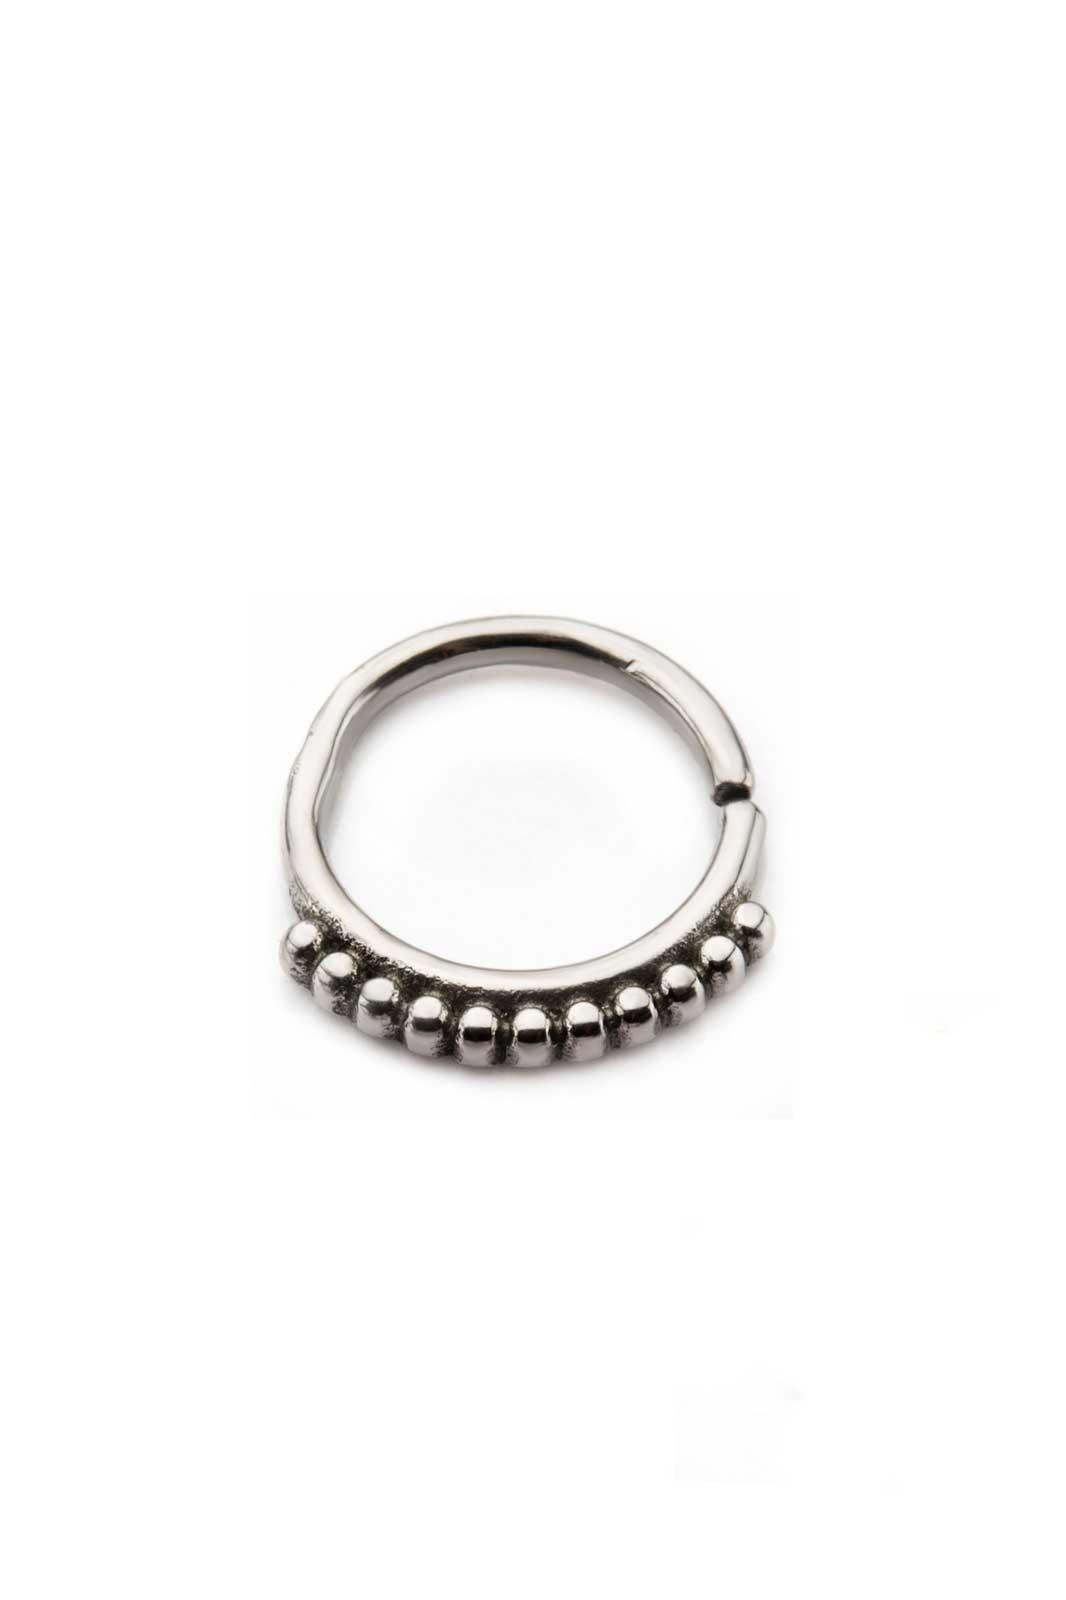 Annealed Shotball Ring